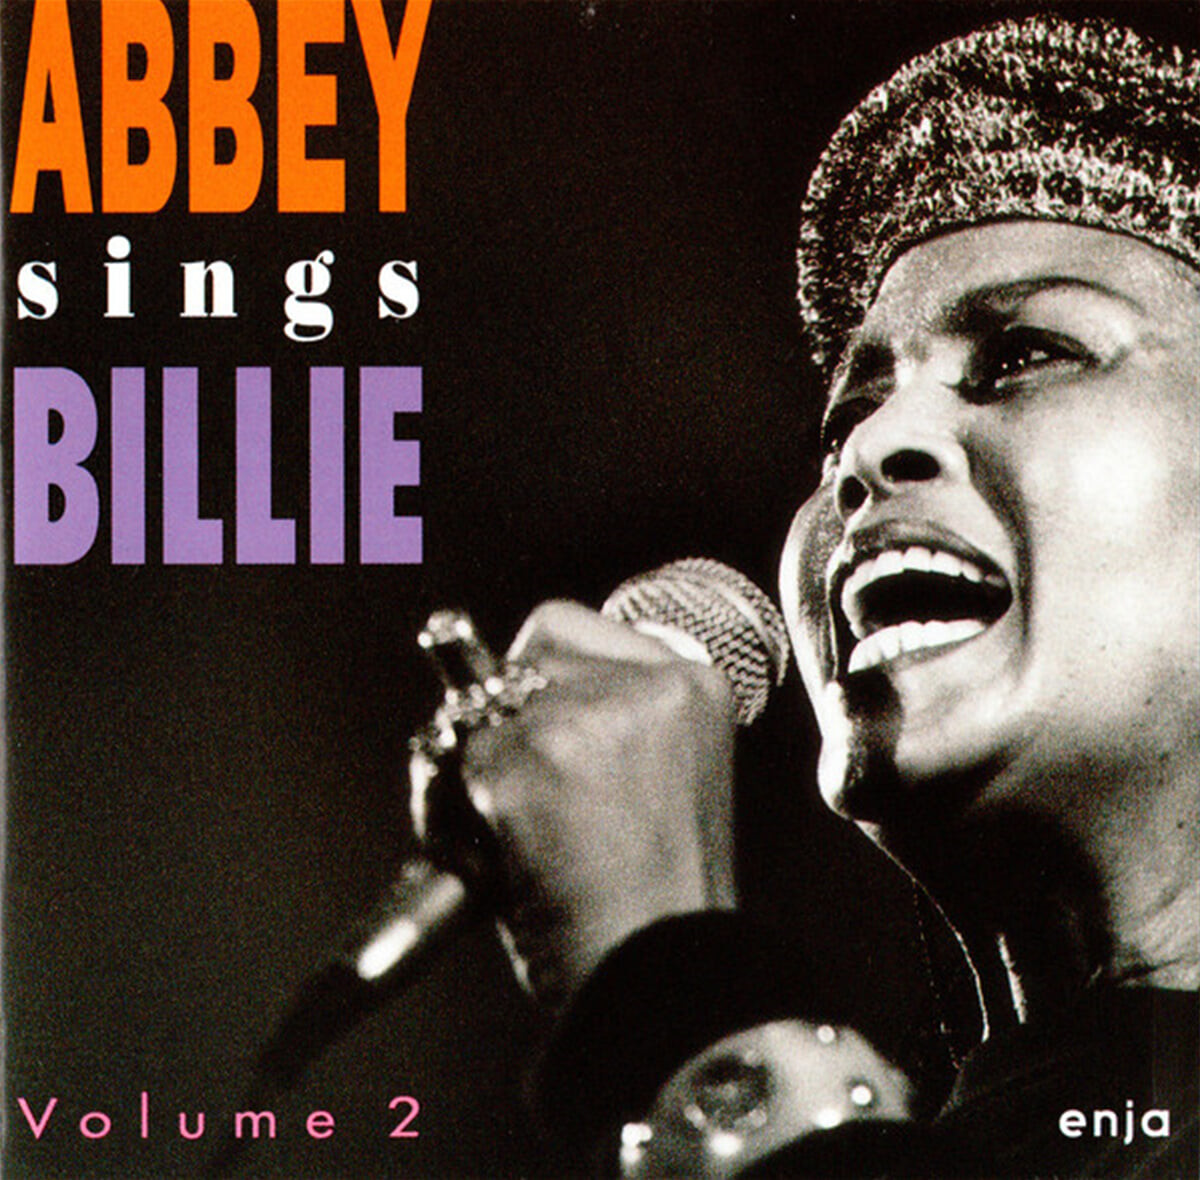 Abbey Lincoln (아비 린코인) - Abbey Sings Billie Volume 2